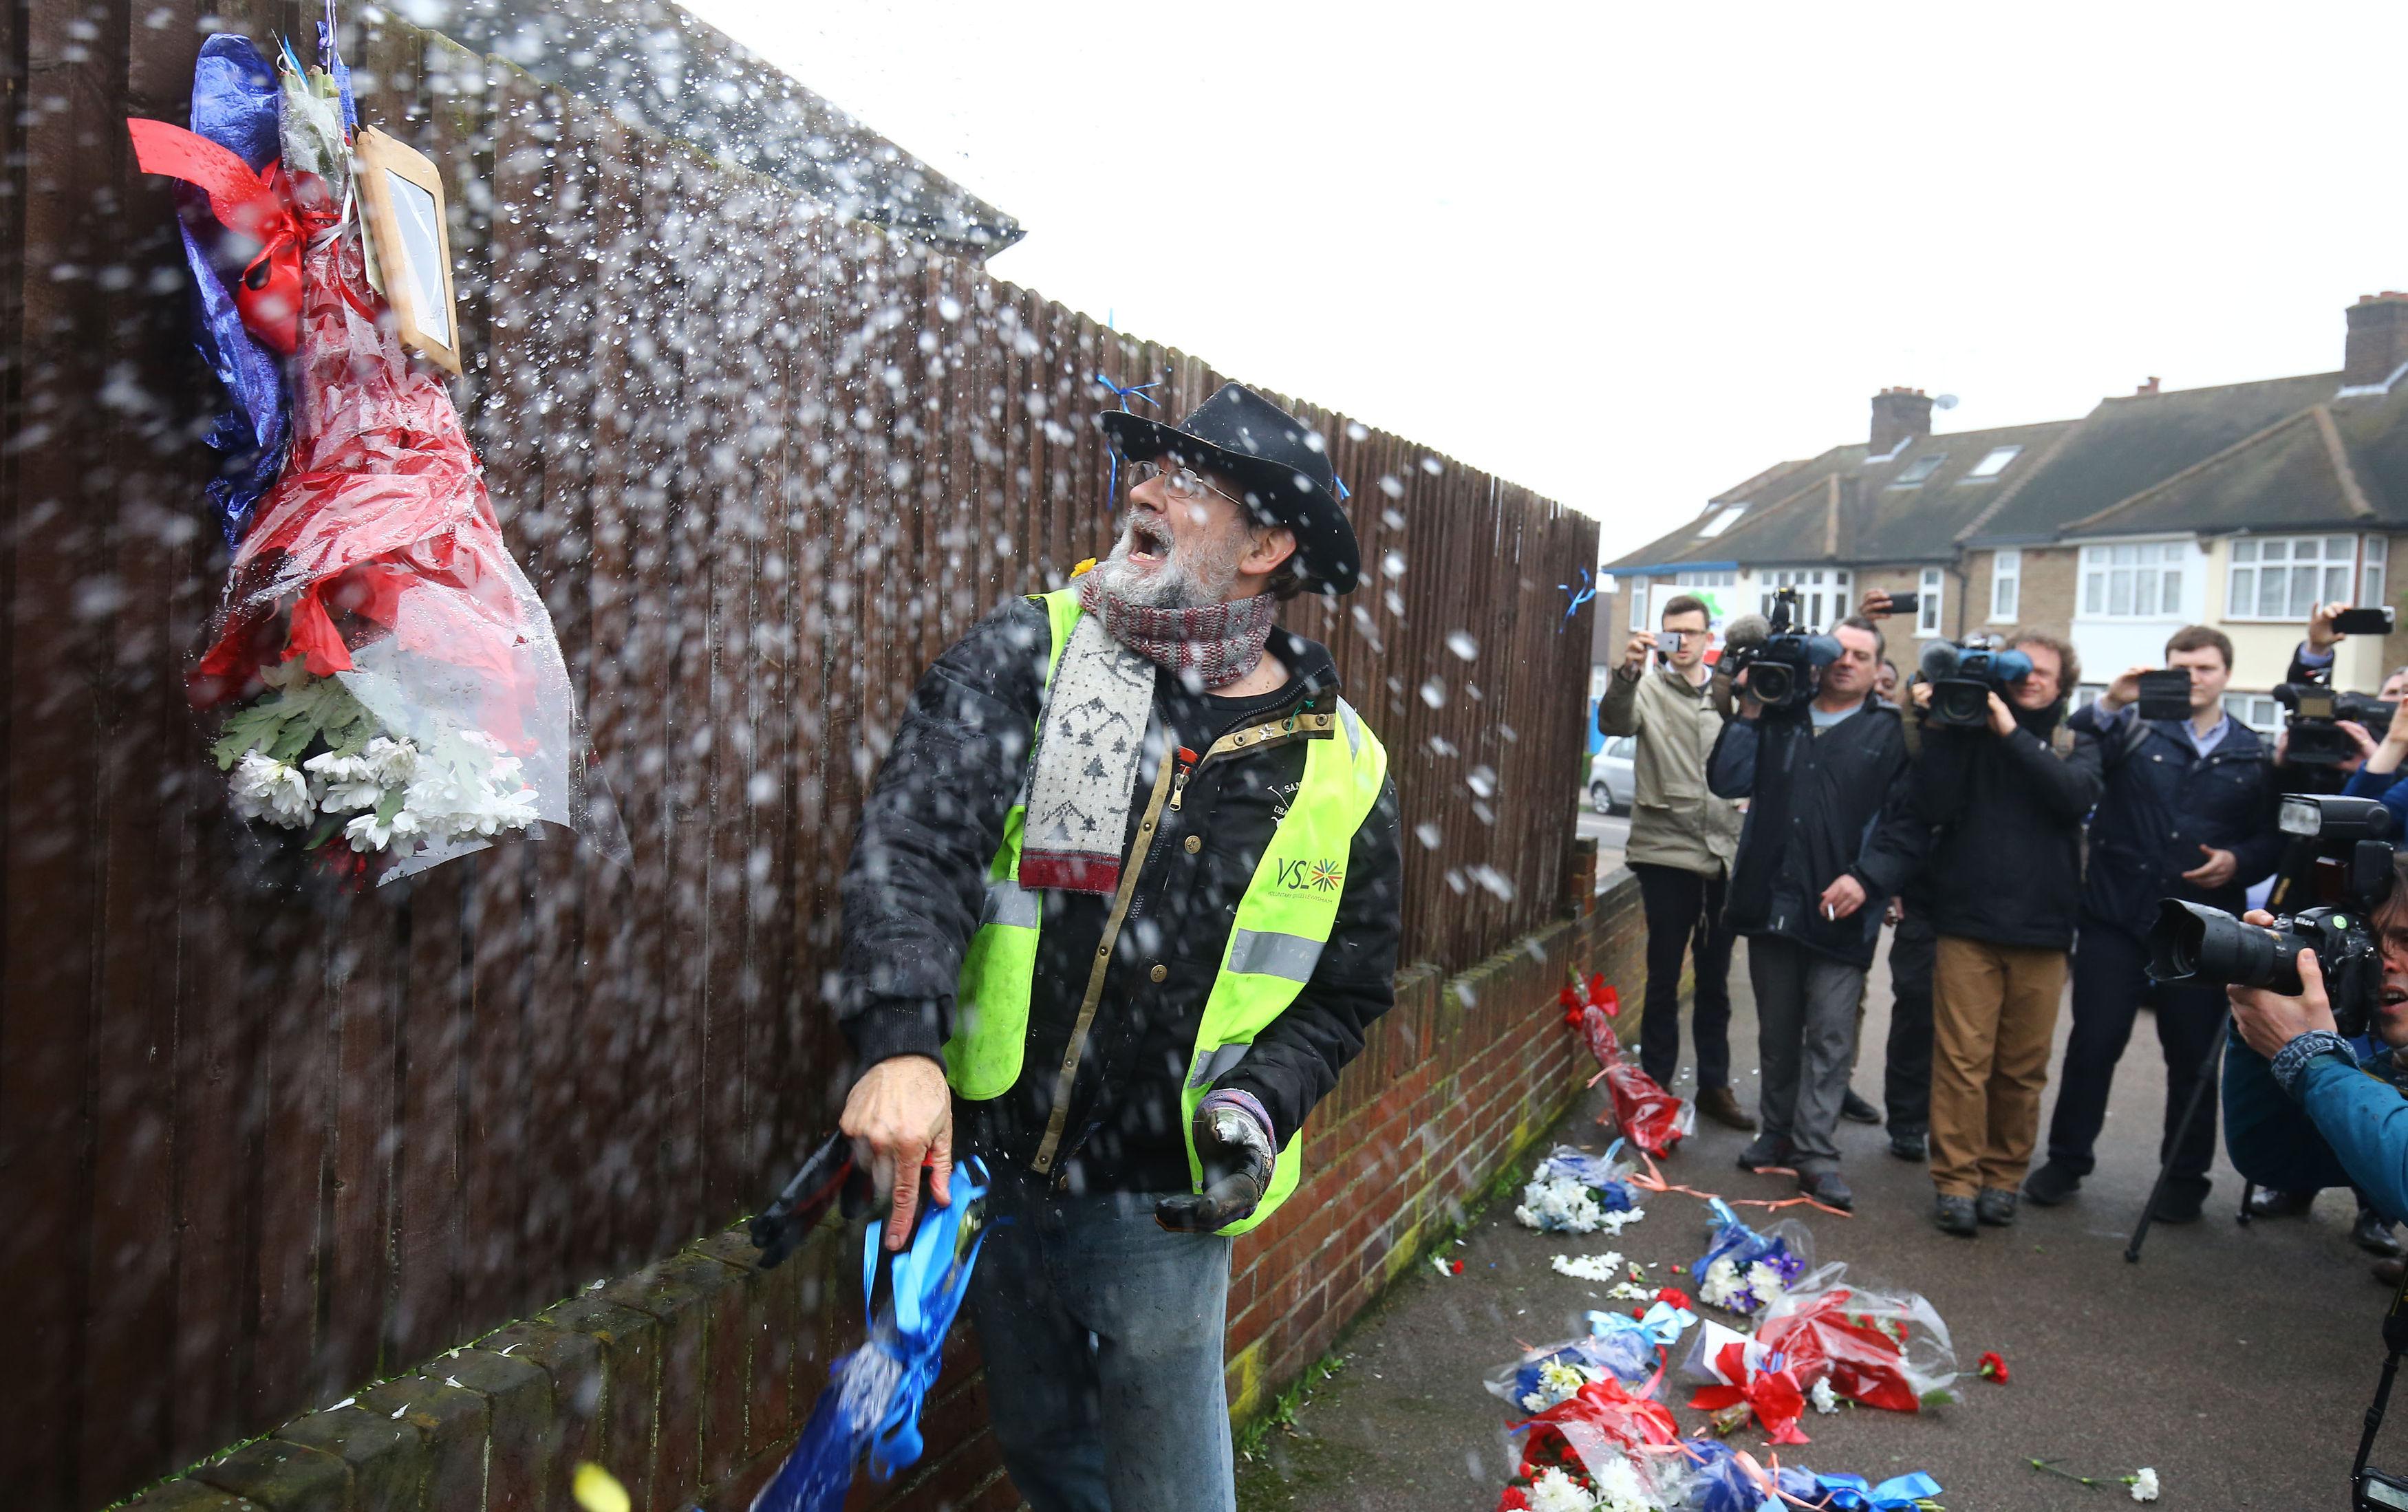 Vigilante Iain Gordon removes the flowers. Credit: PA